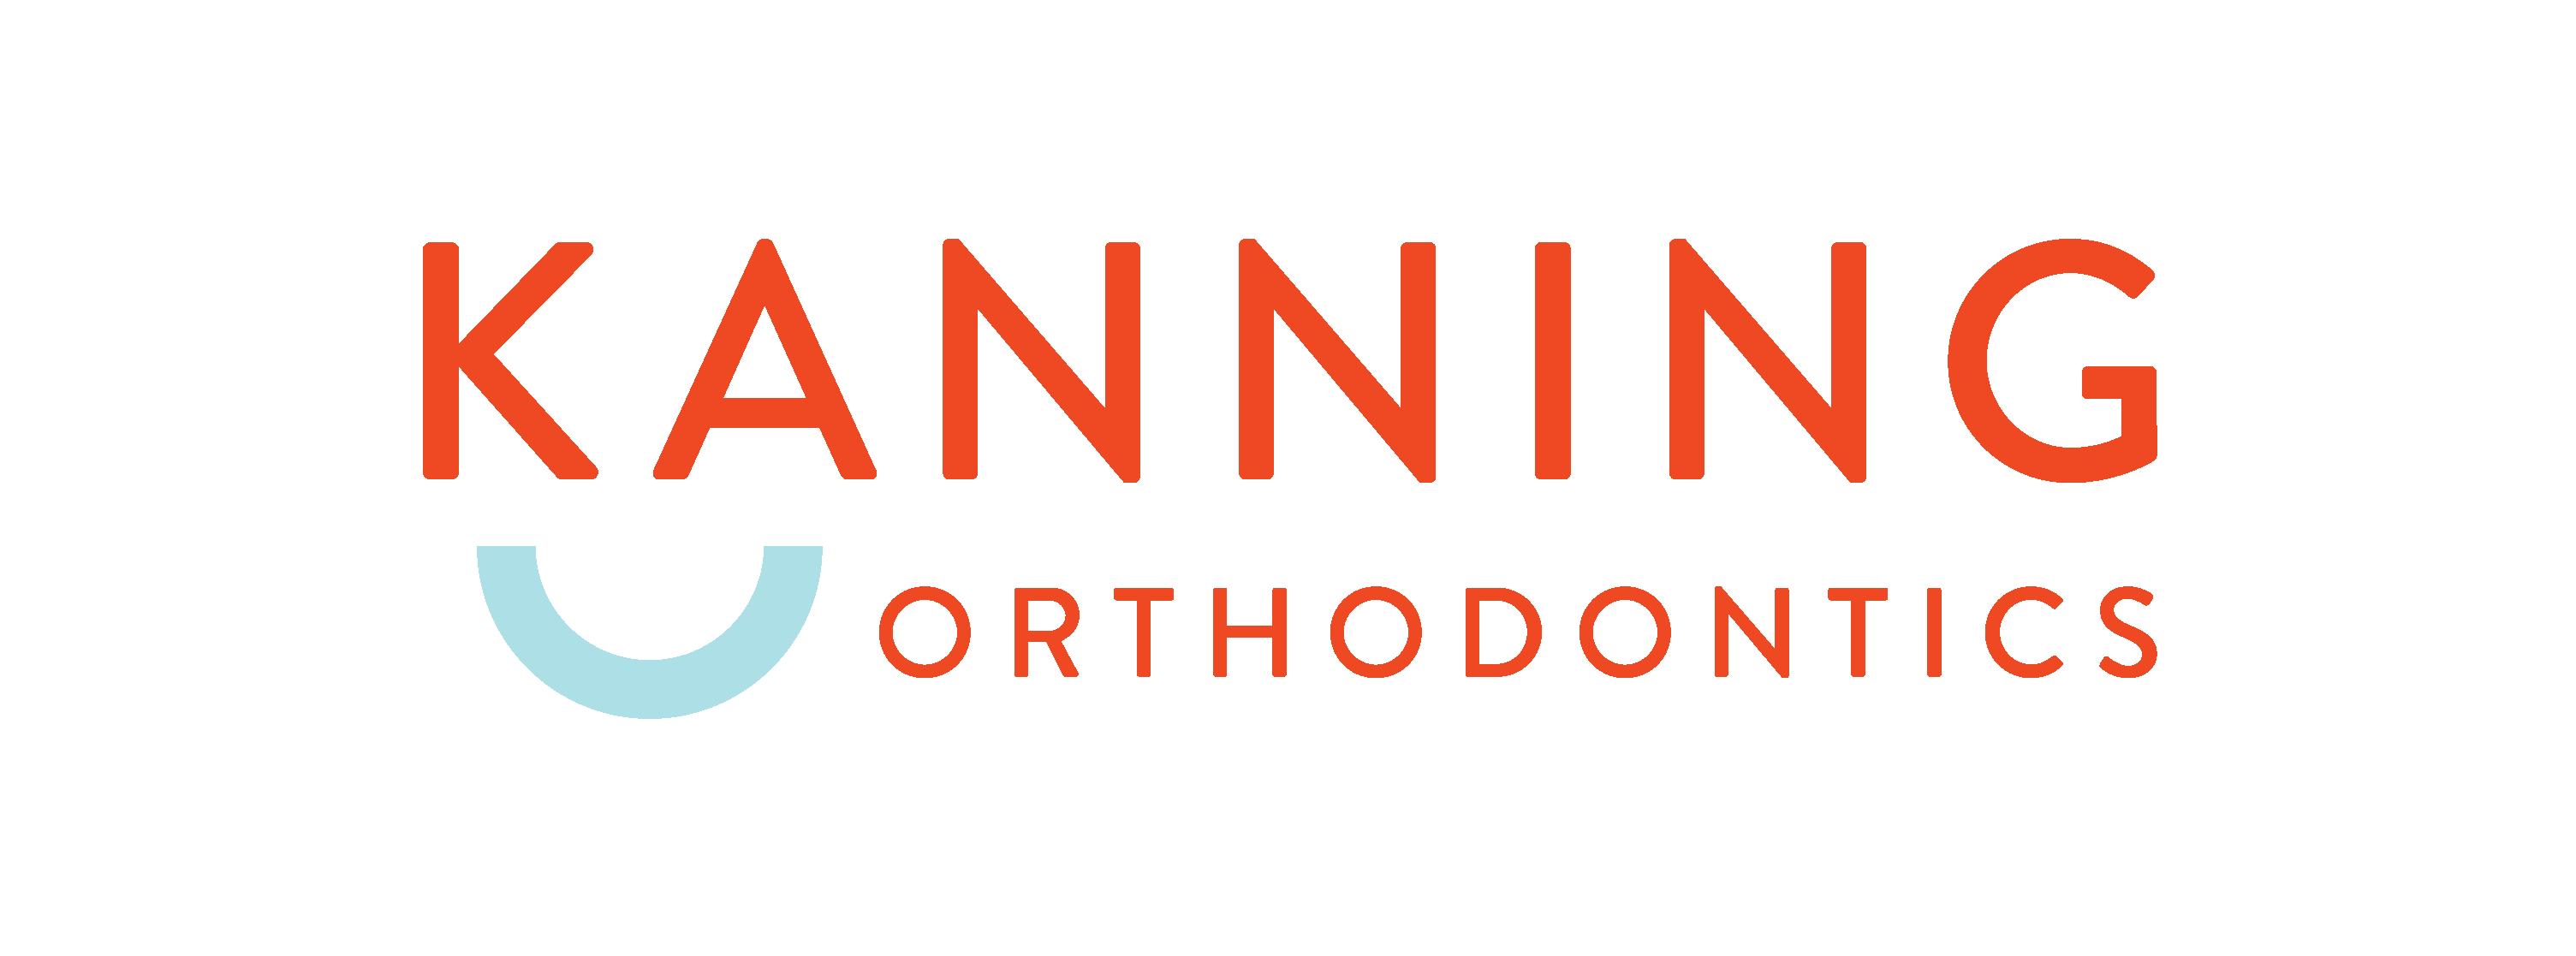 Kanning Orthodontics